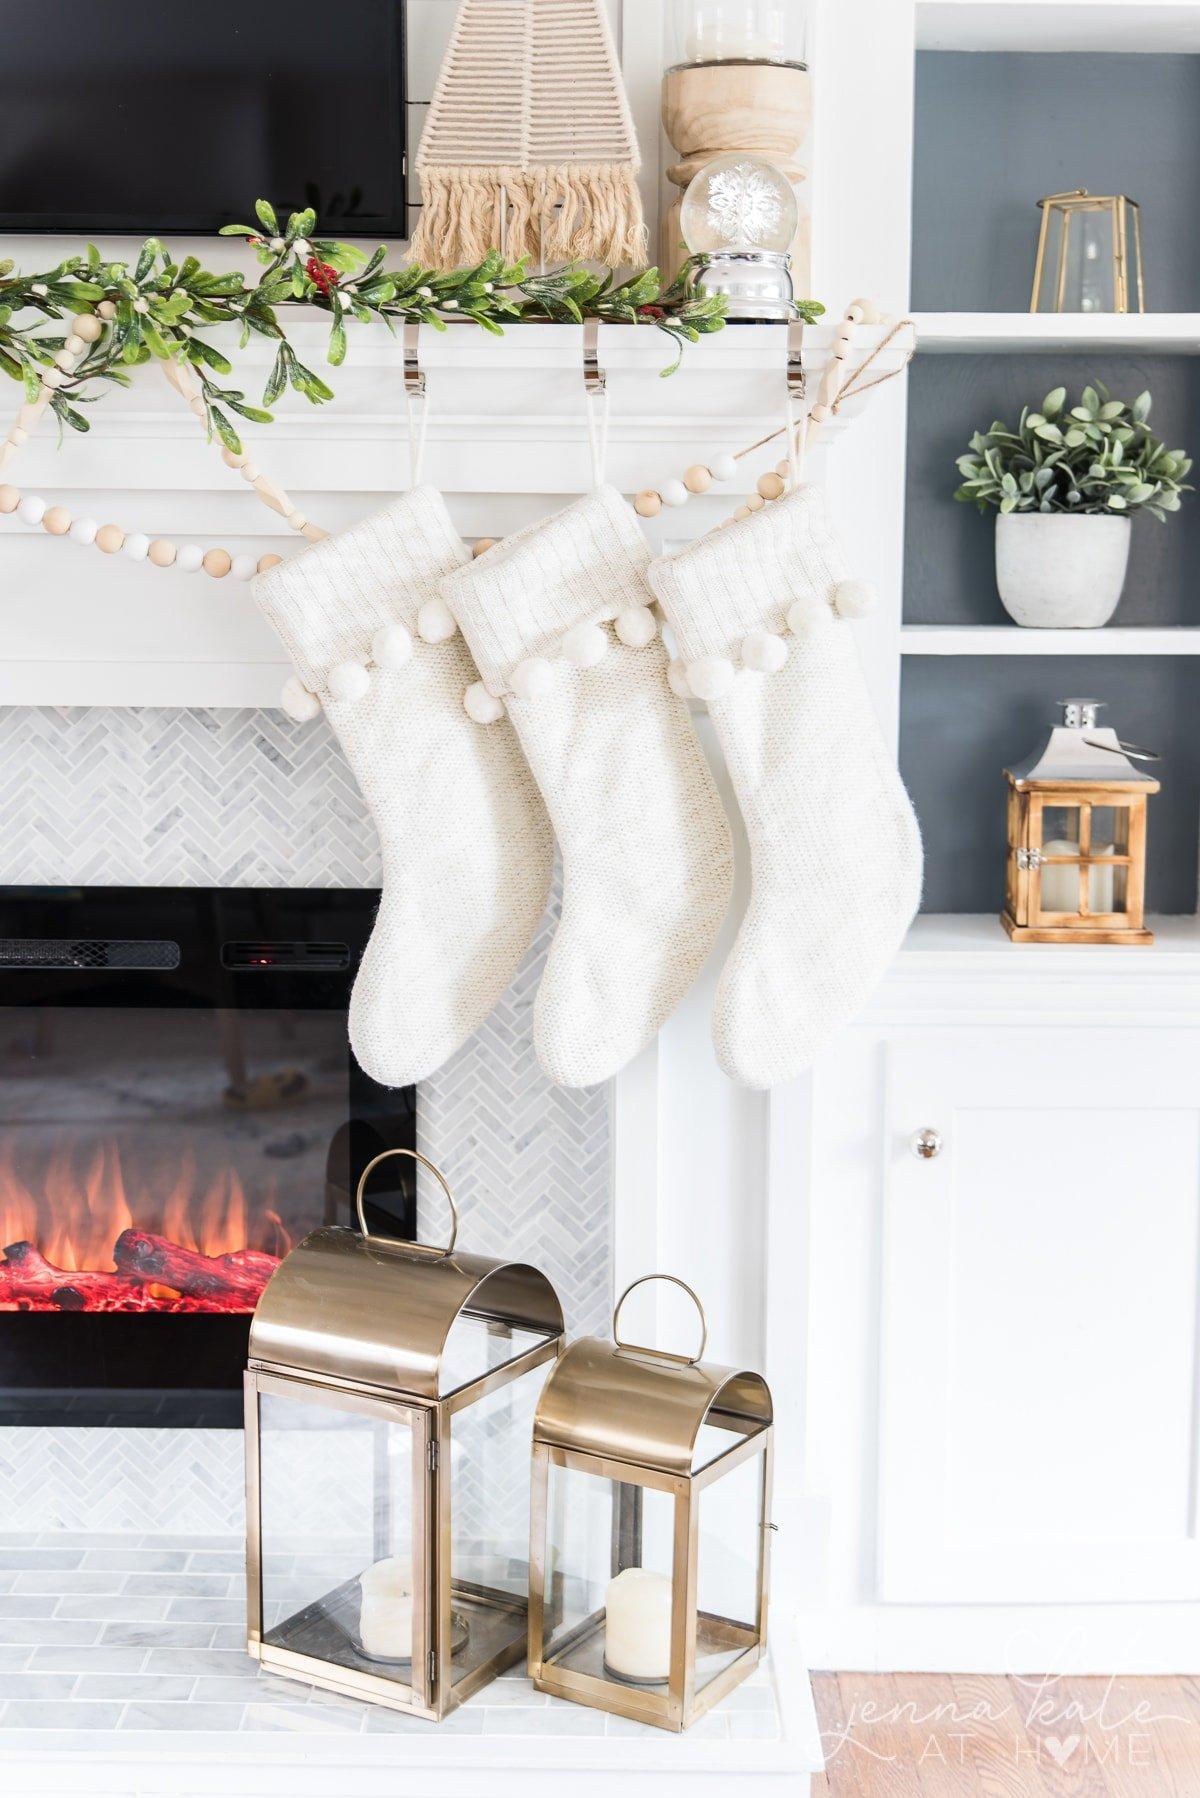 Simple and easy Christmas mantel decor ideas